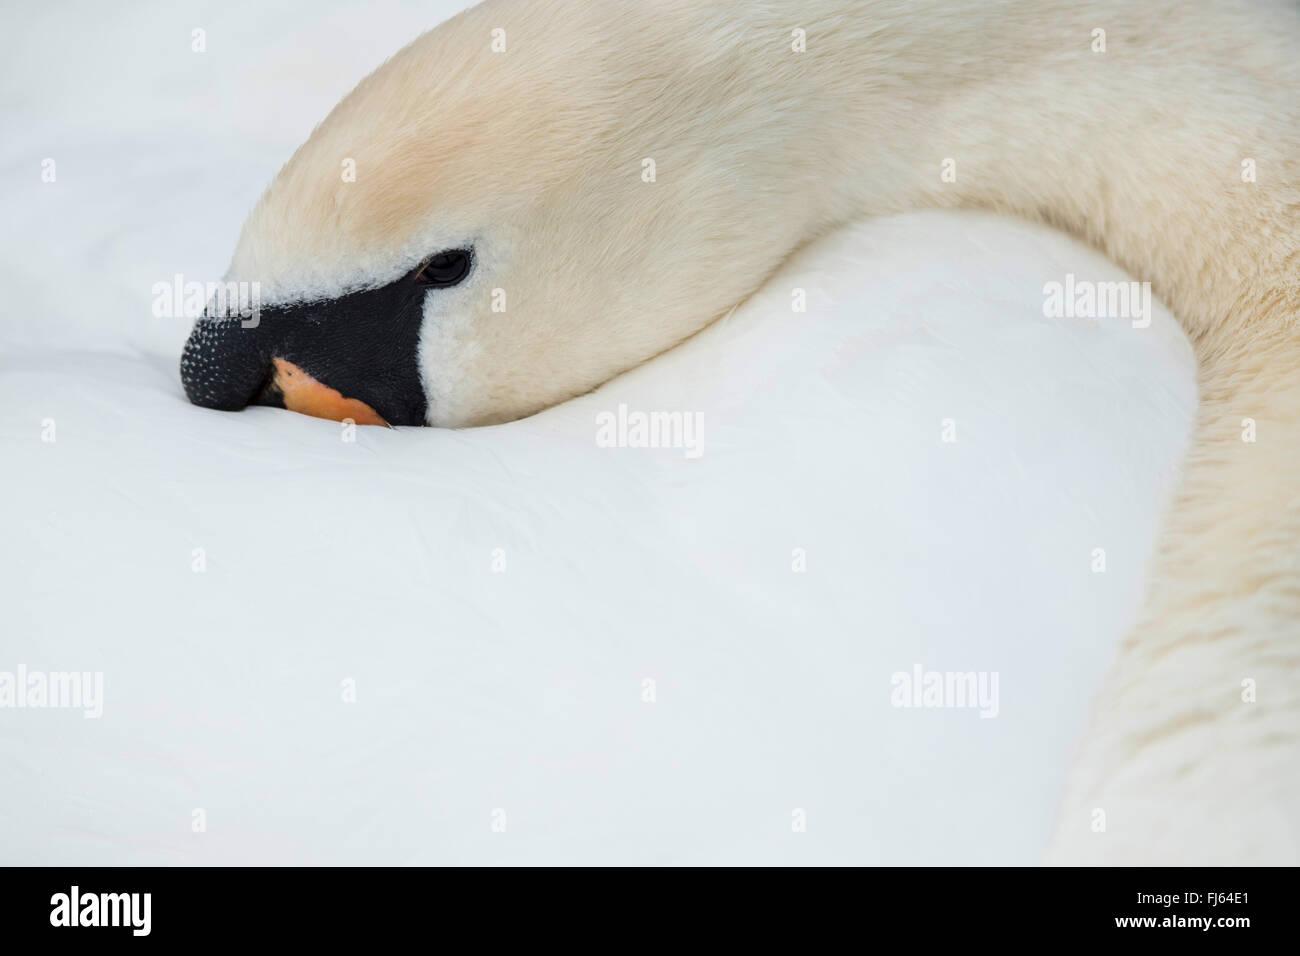 mute swan (Cygnus olor), head in its plumage, Germany - Stock Image